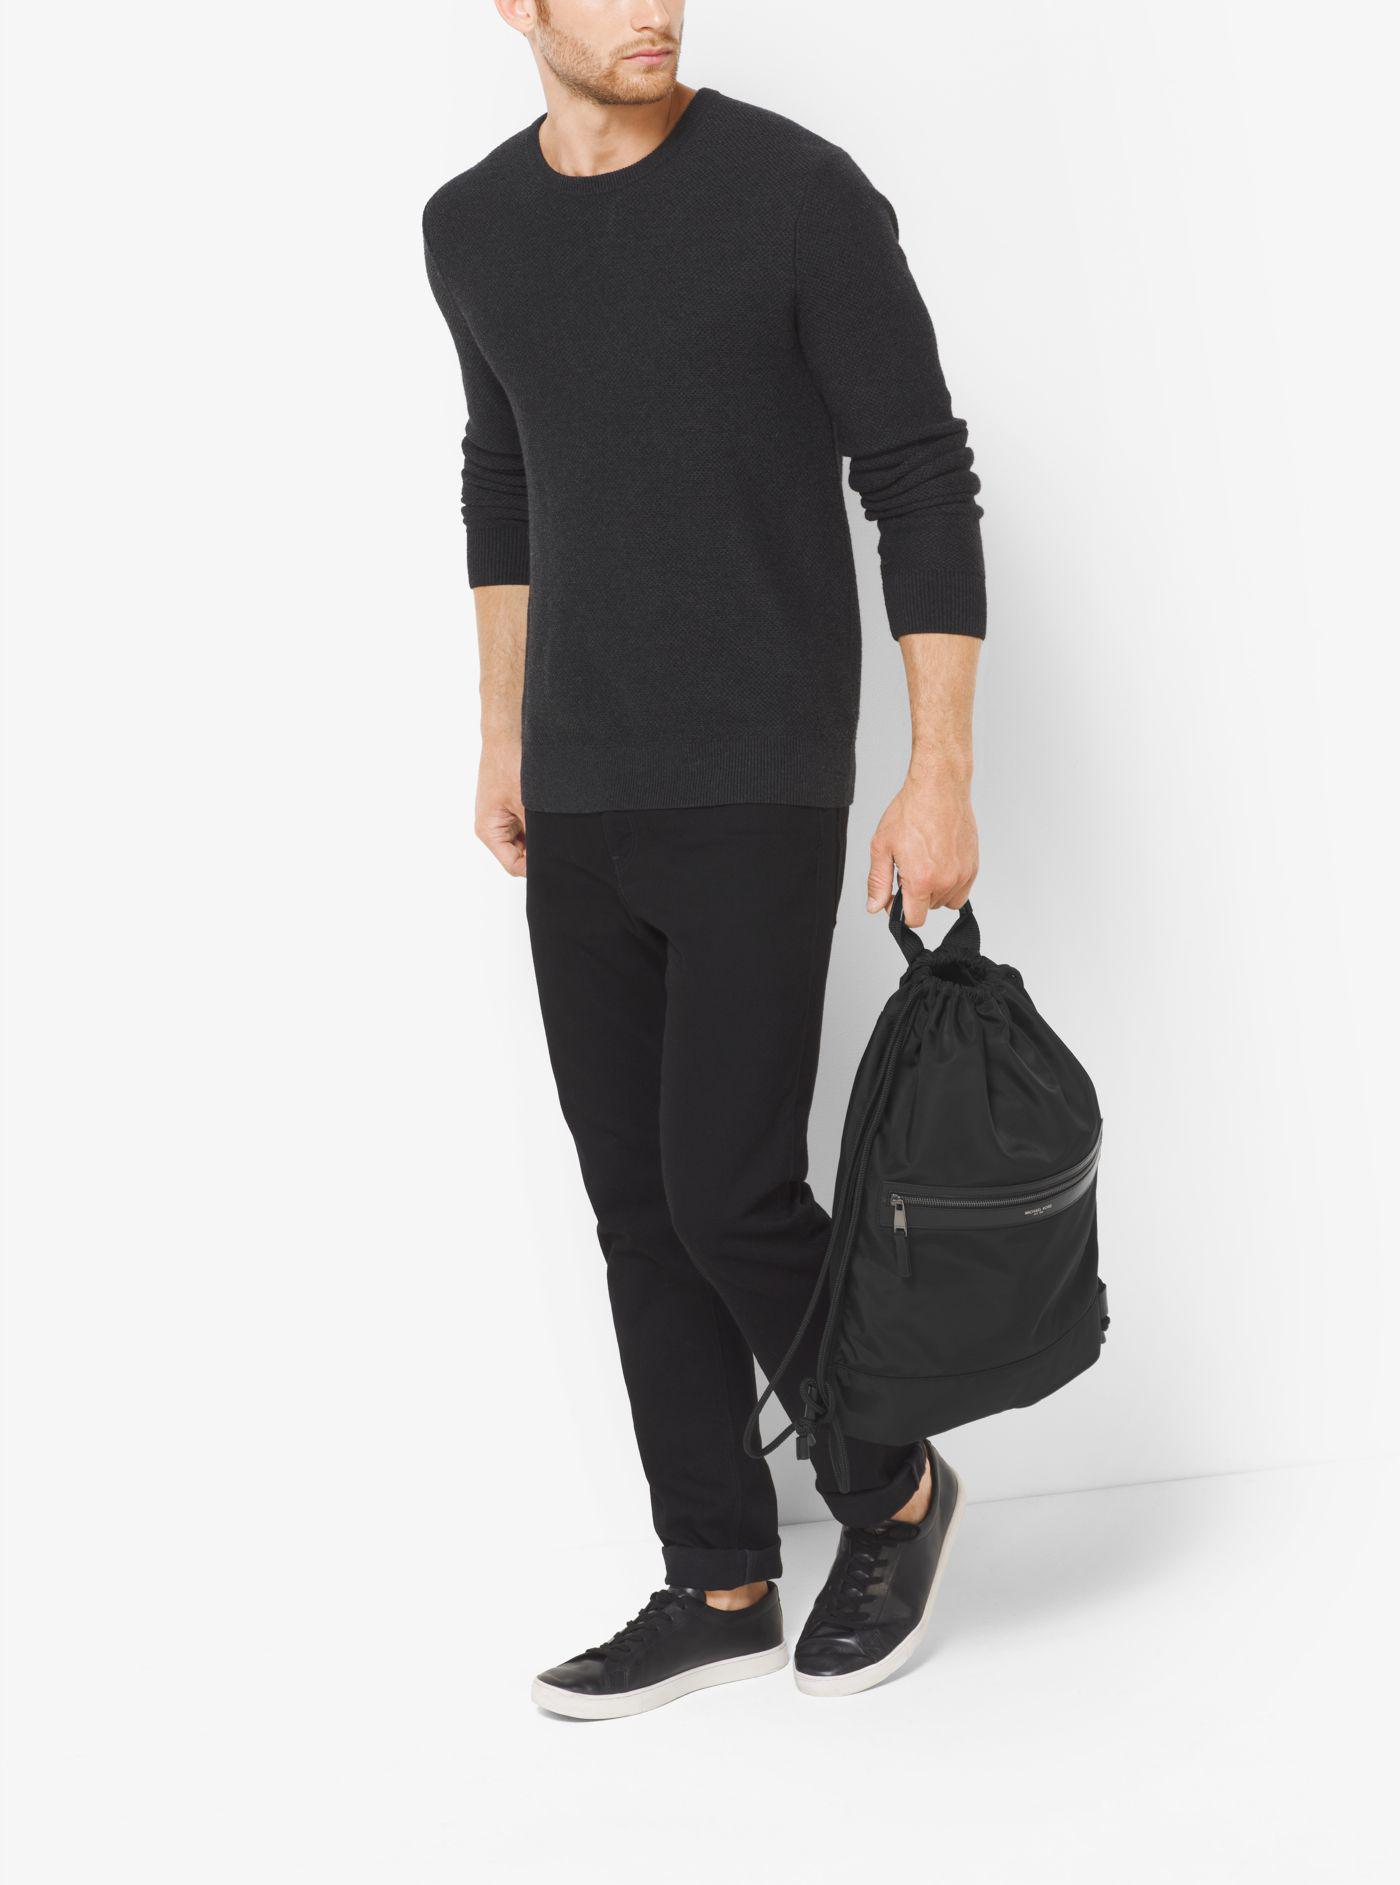 331016941 f81afcfb5349 Michael Kors Kent Nylon Drawstring Backpack in Black for Men -  Lyst ...